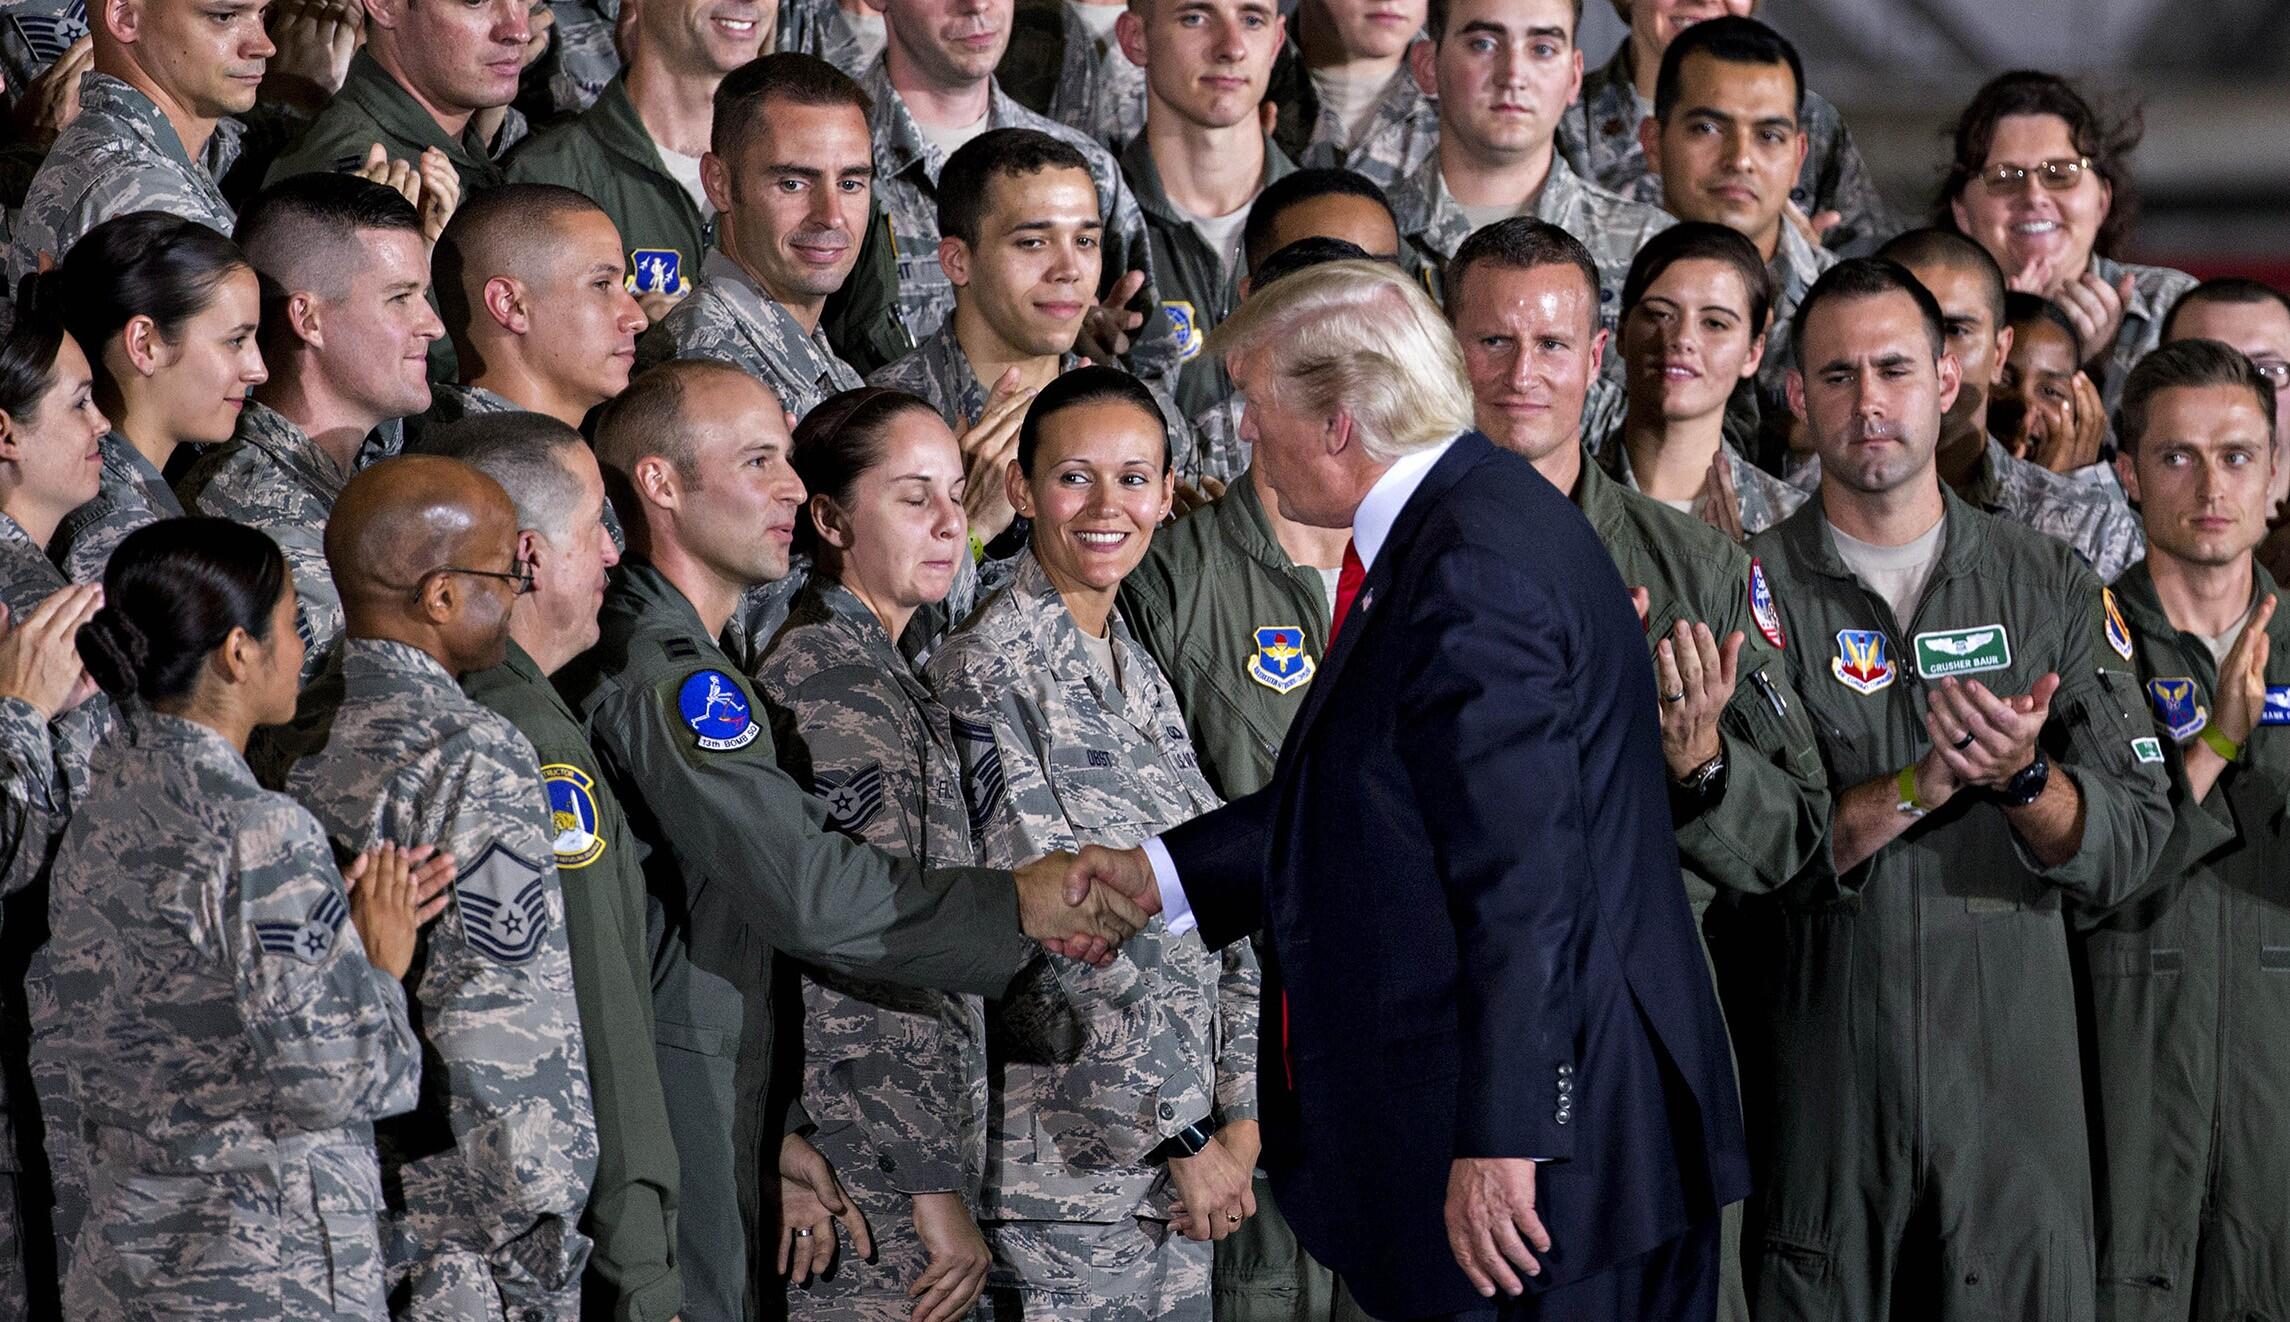 Trump adds 'Make America Great Again' to presidential